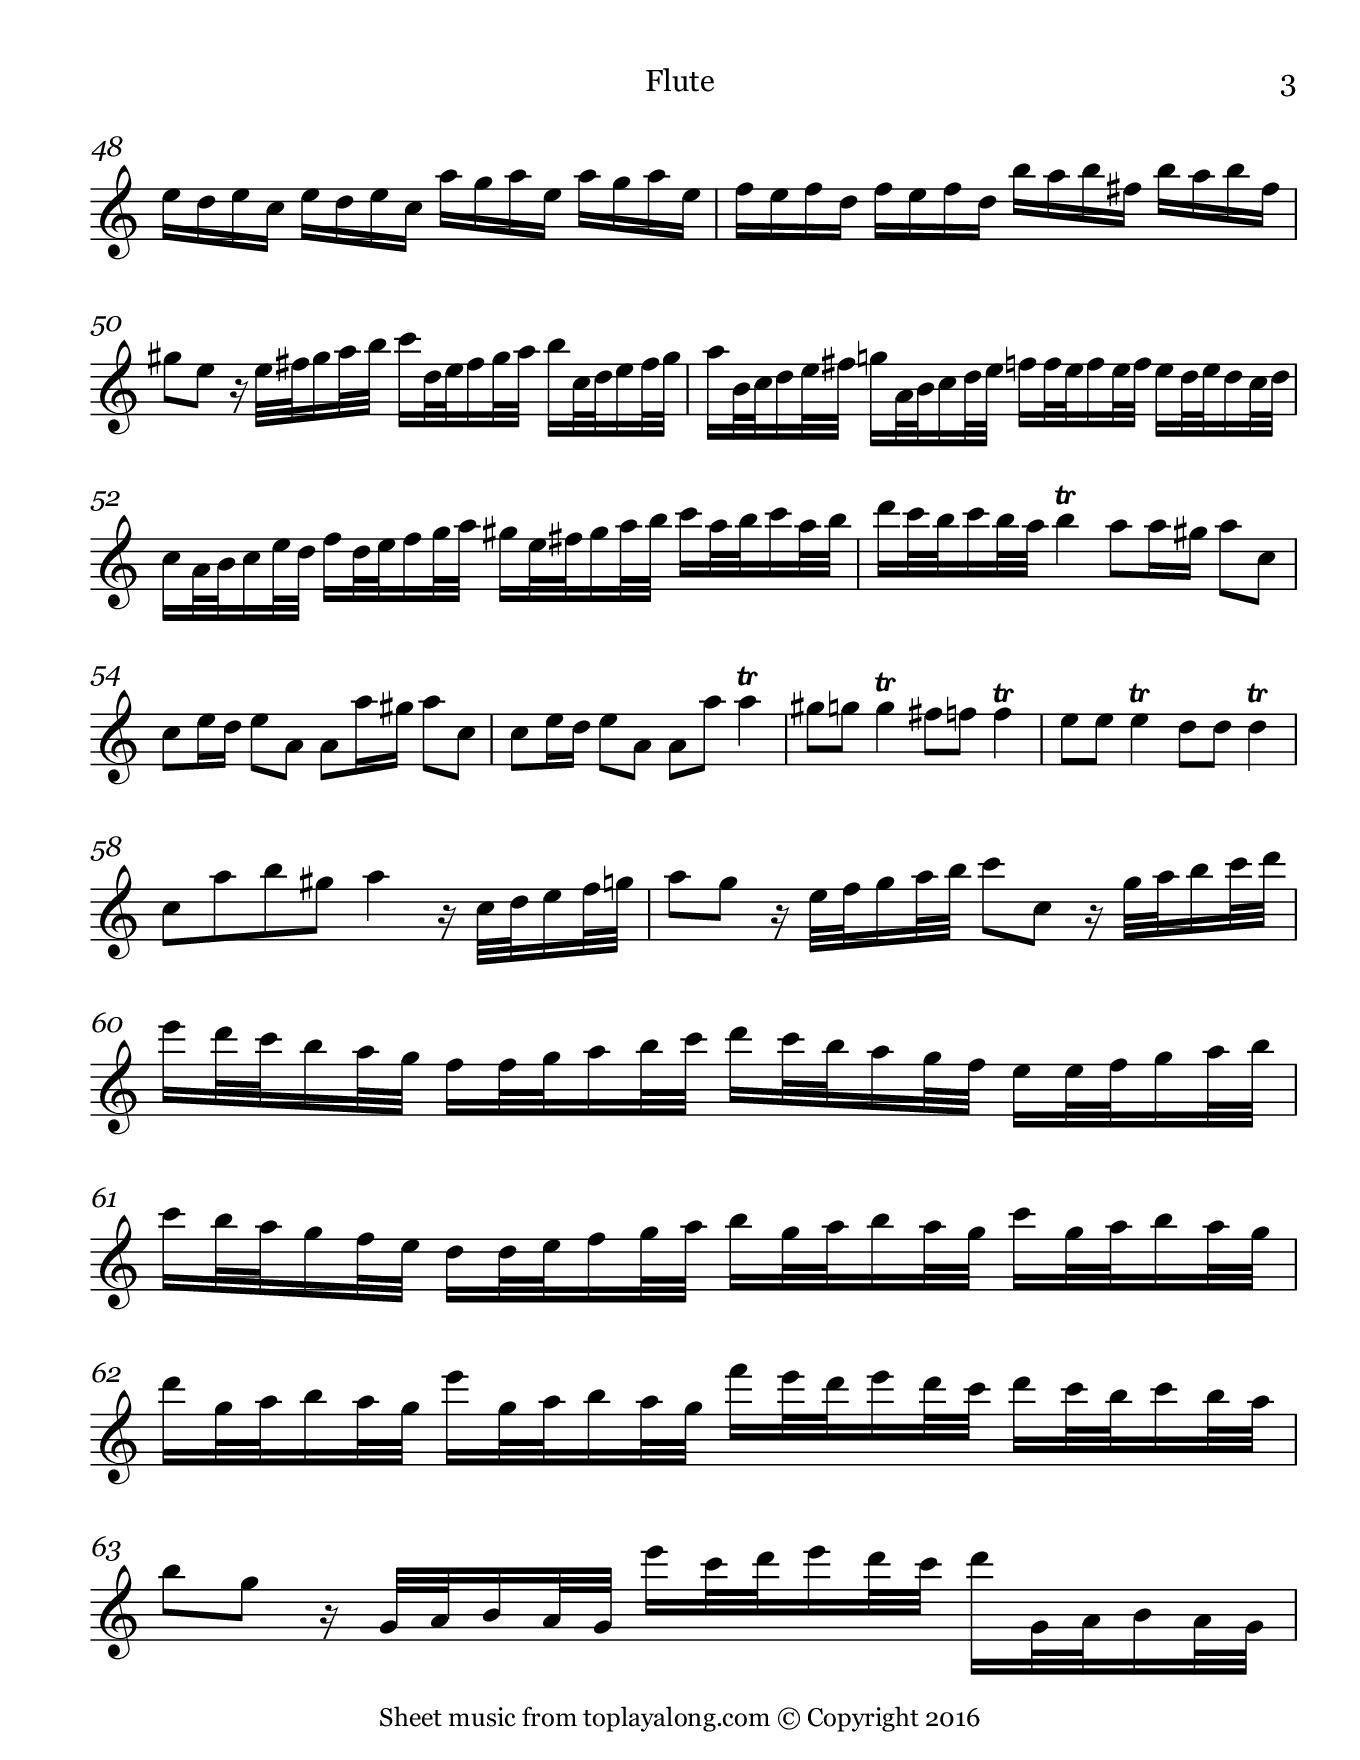 Flautino Concerto in C major RV 443 (III. Allegro molto) by Vivaldi. Sheet music for Flute, page 3.